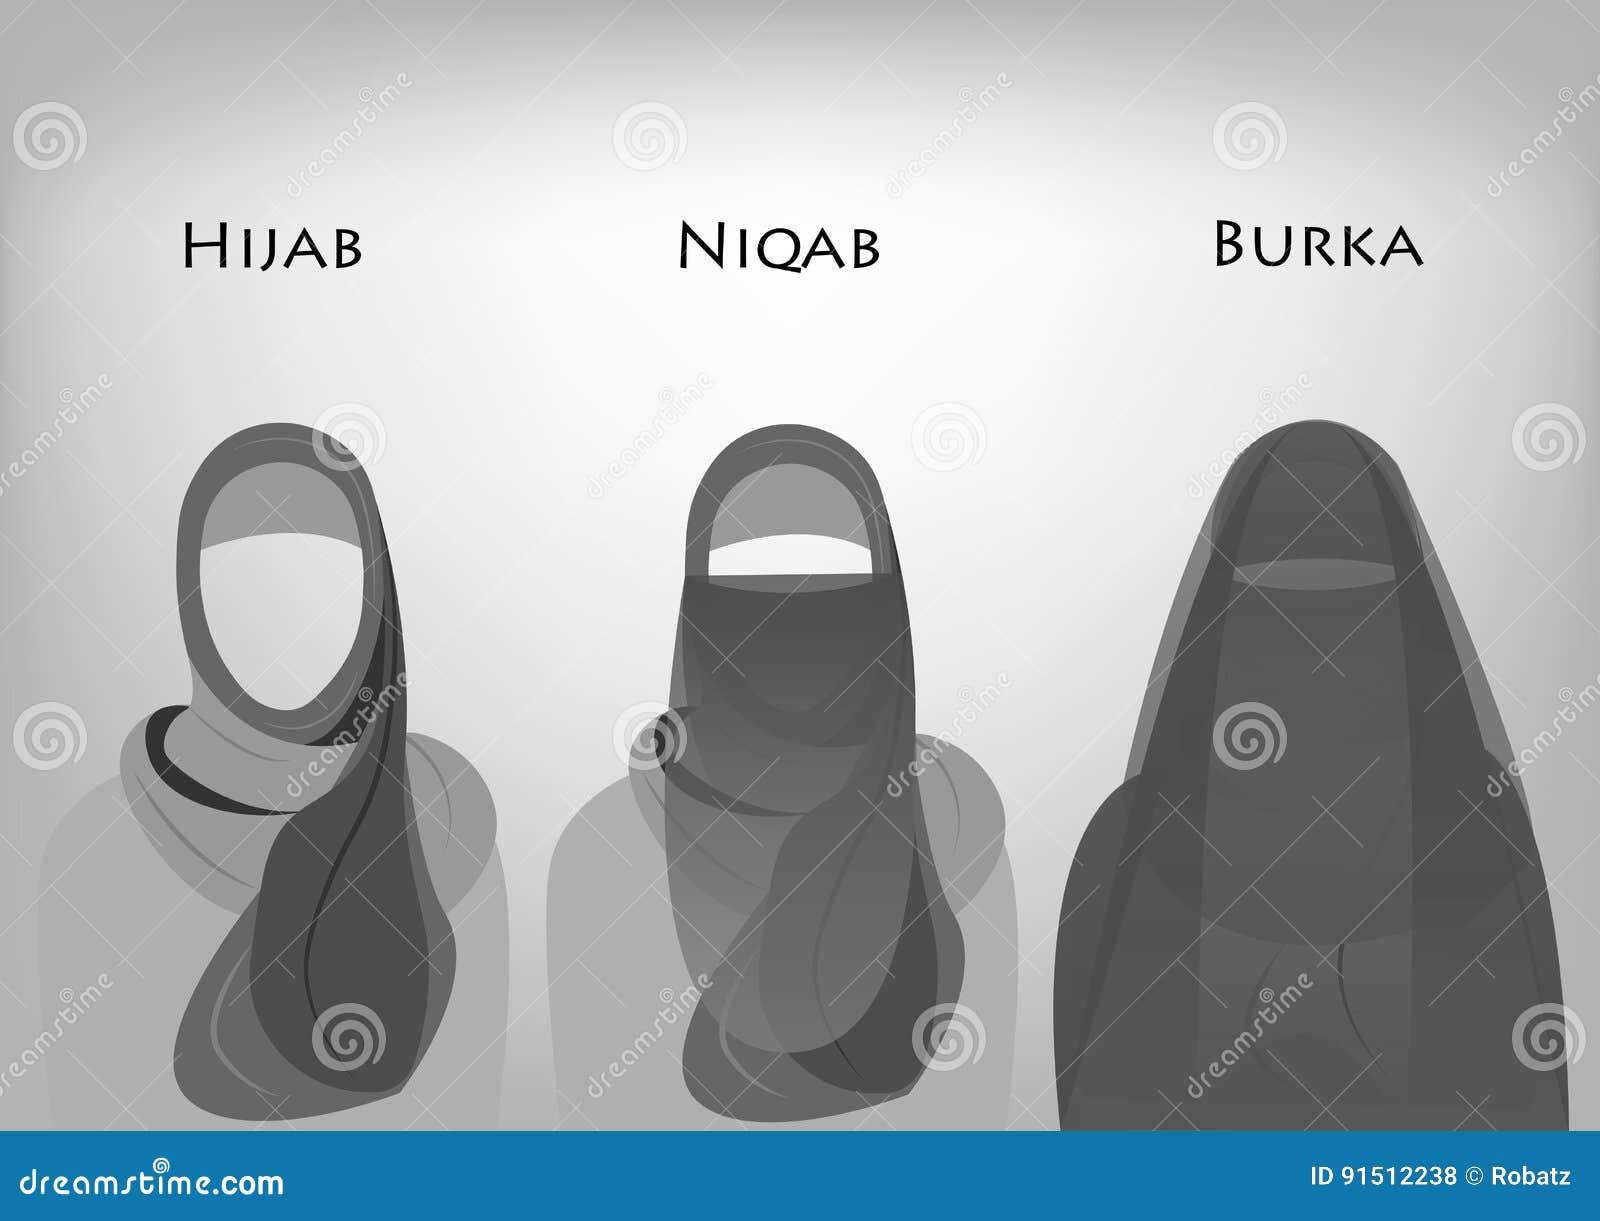 burka cartoons illustrations amp vector stock images 129